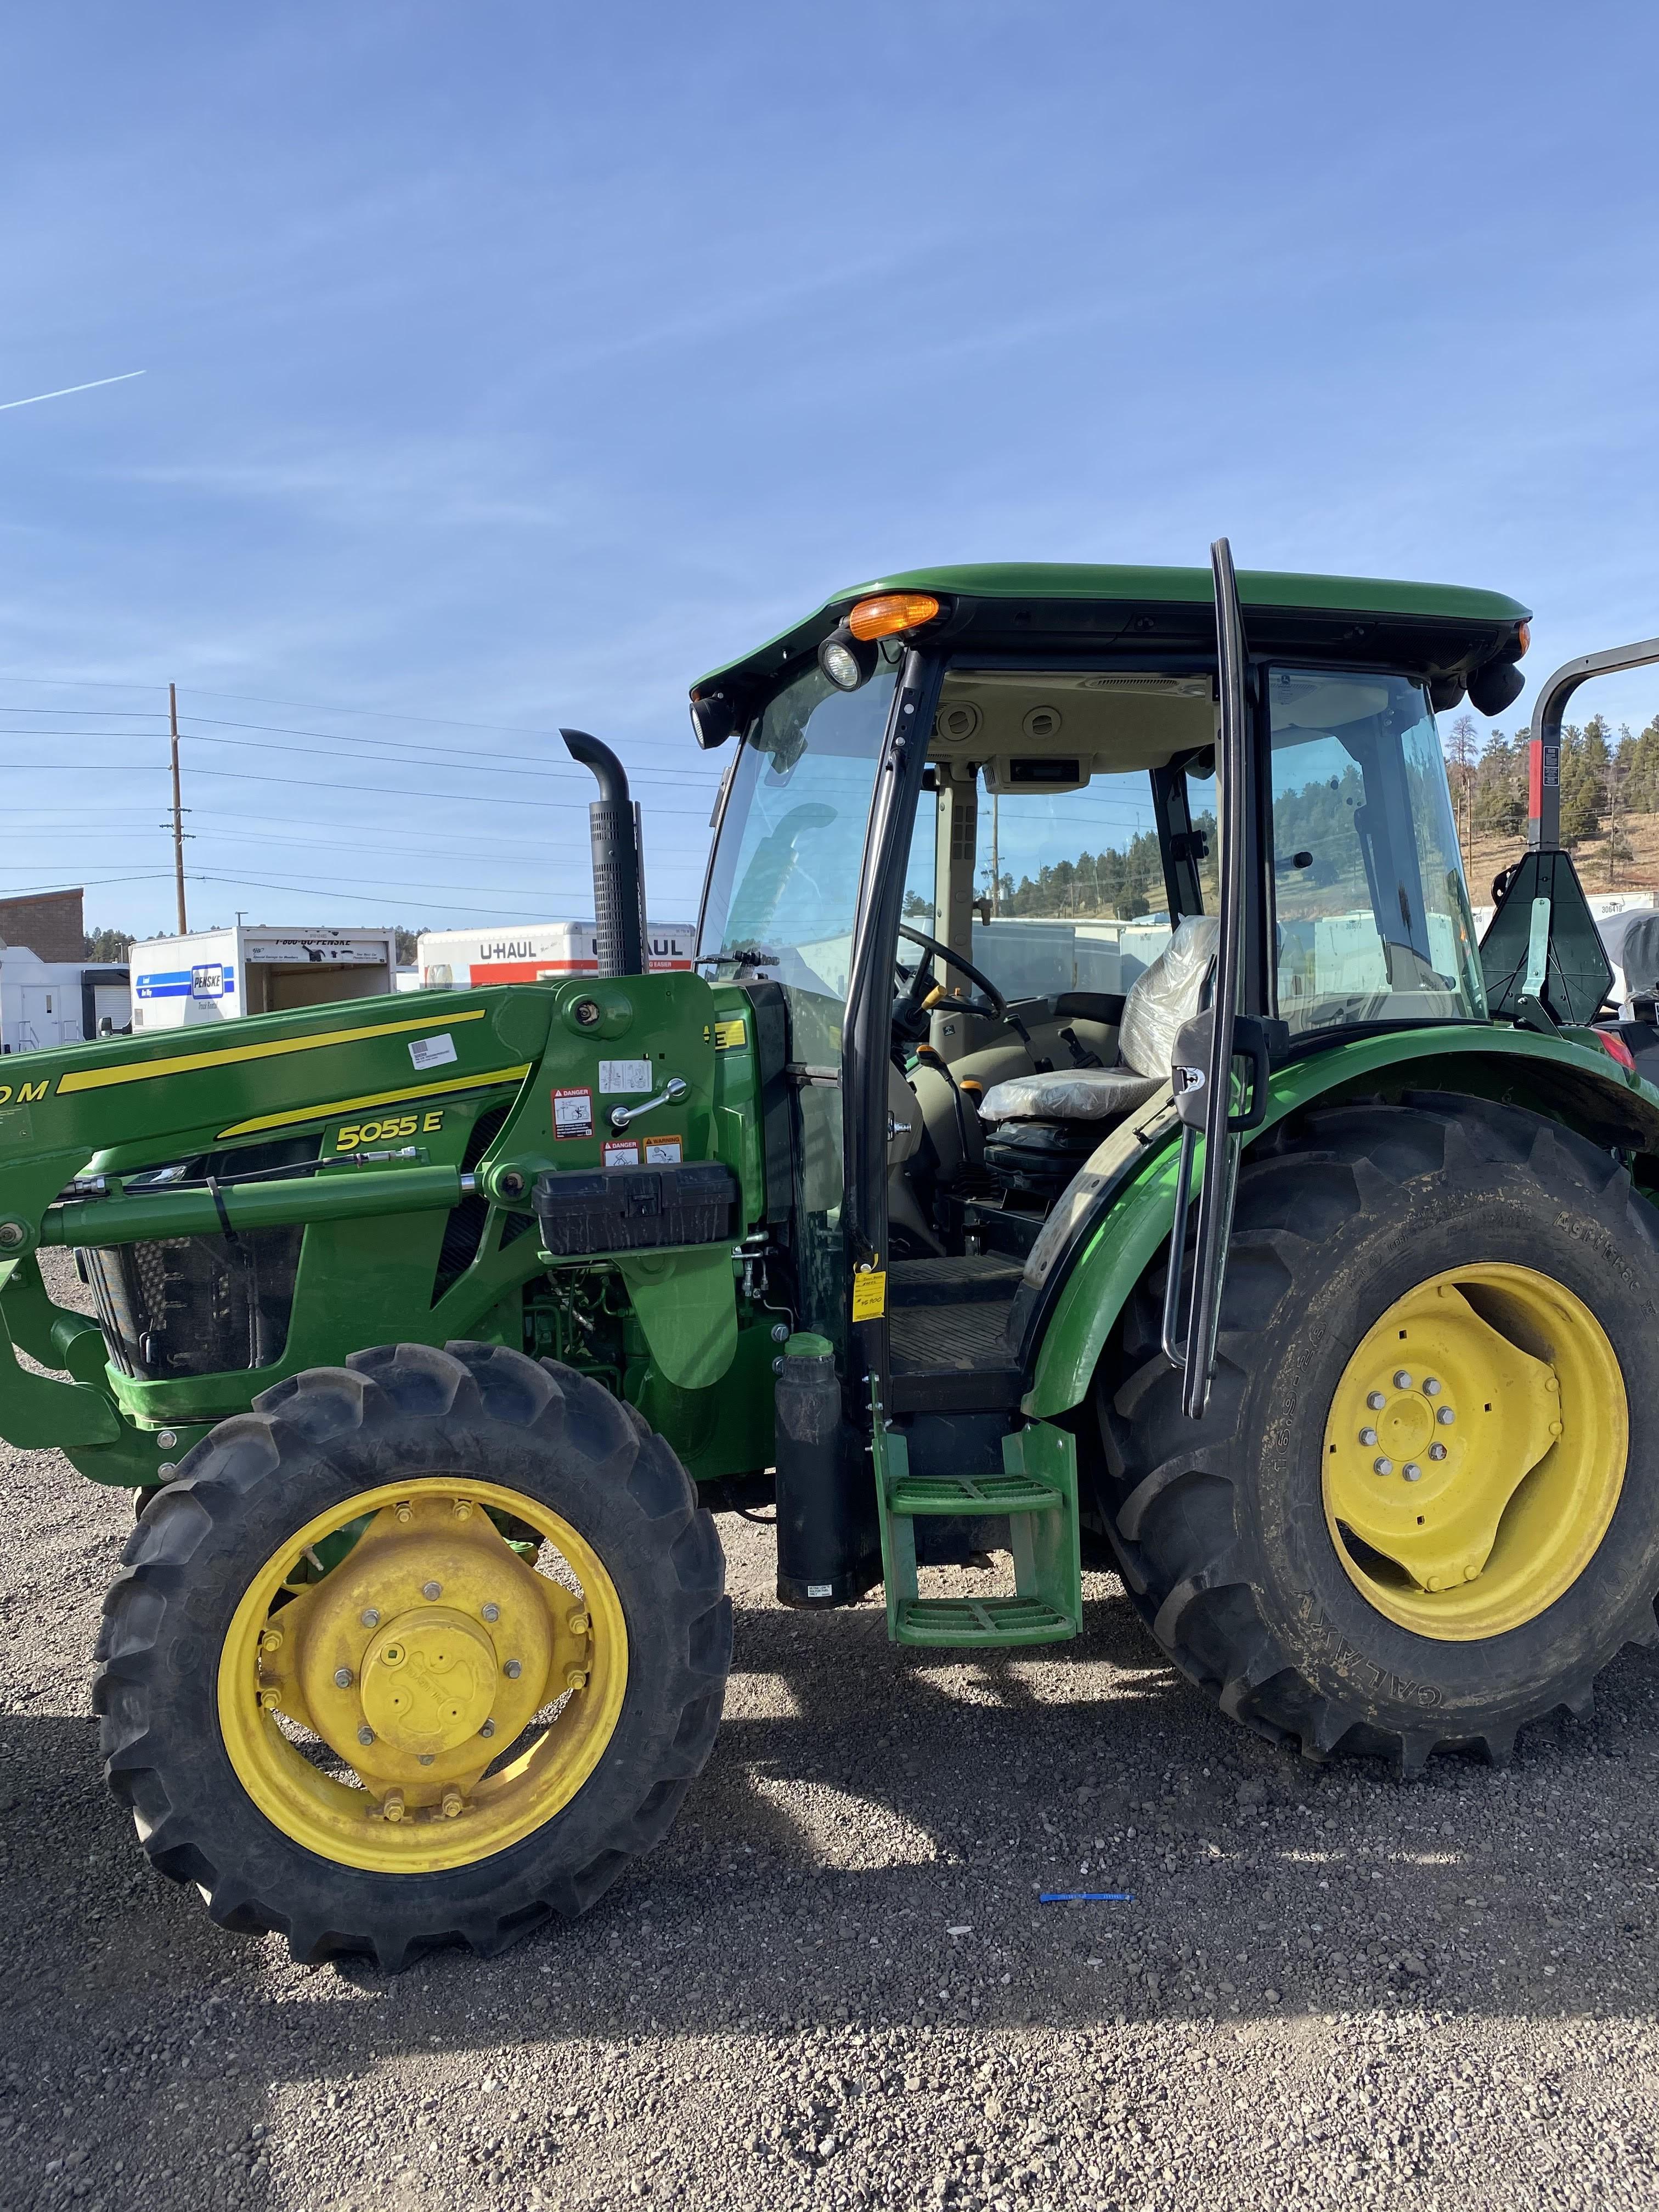 Used, 2015, John Deere, 5055E Cab, Tractors